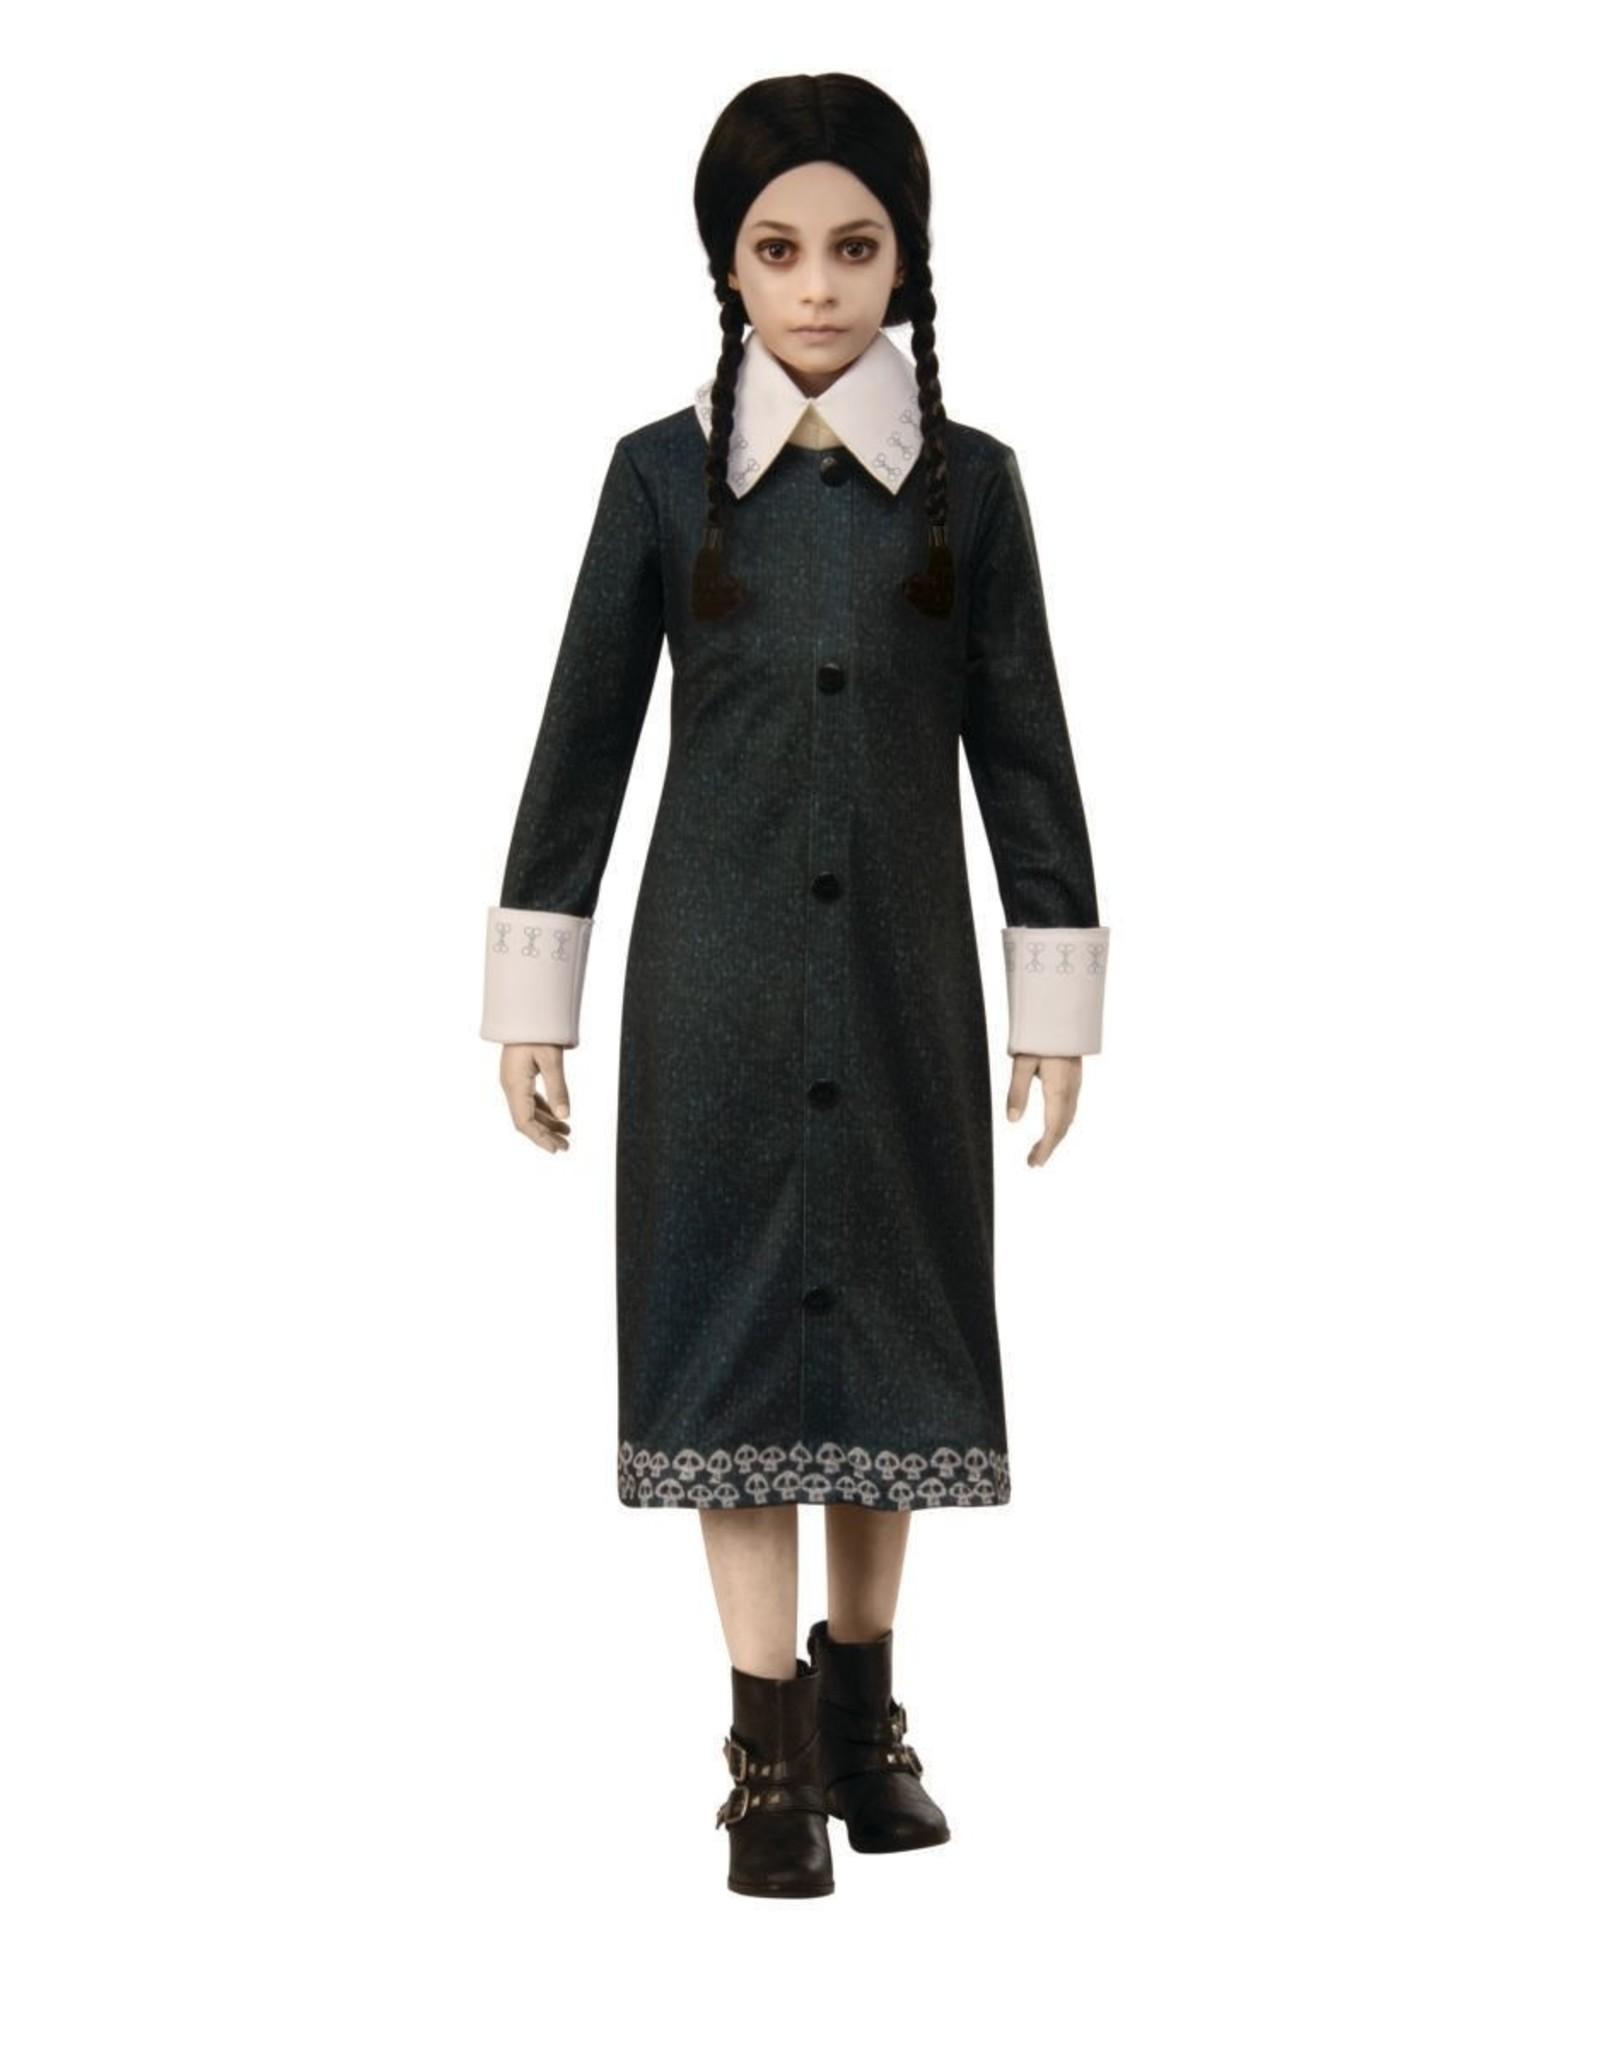 Rubies Costume Children's Animated Wednesday Addams